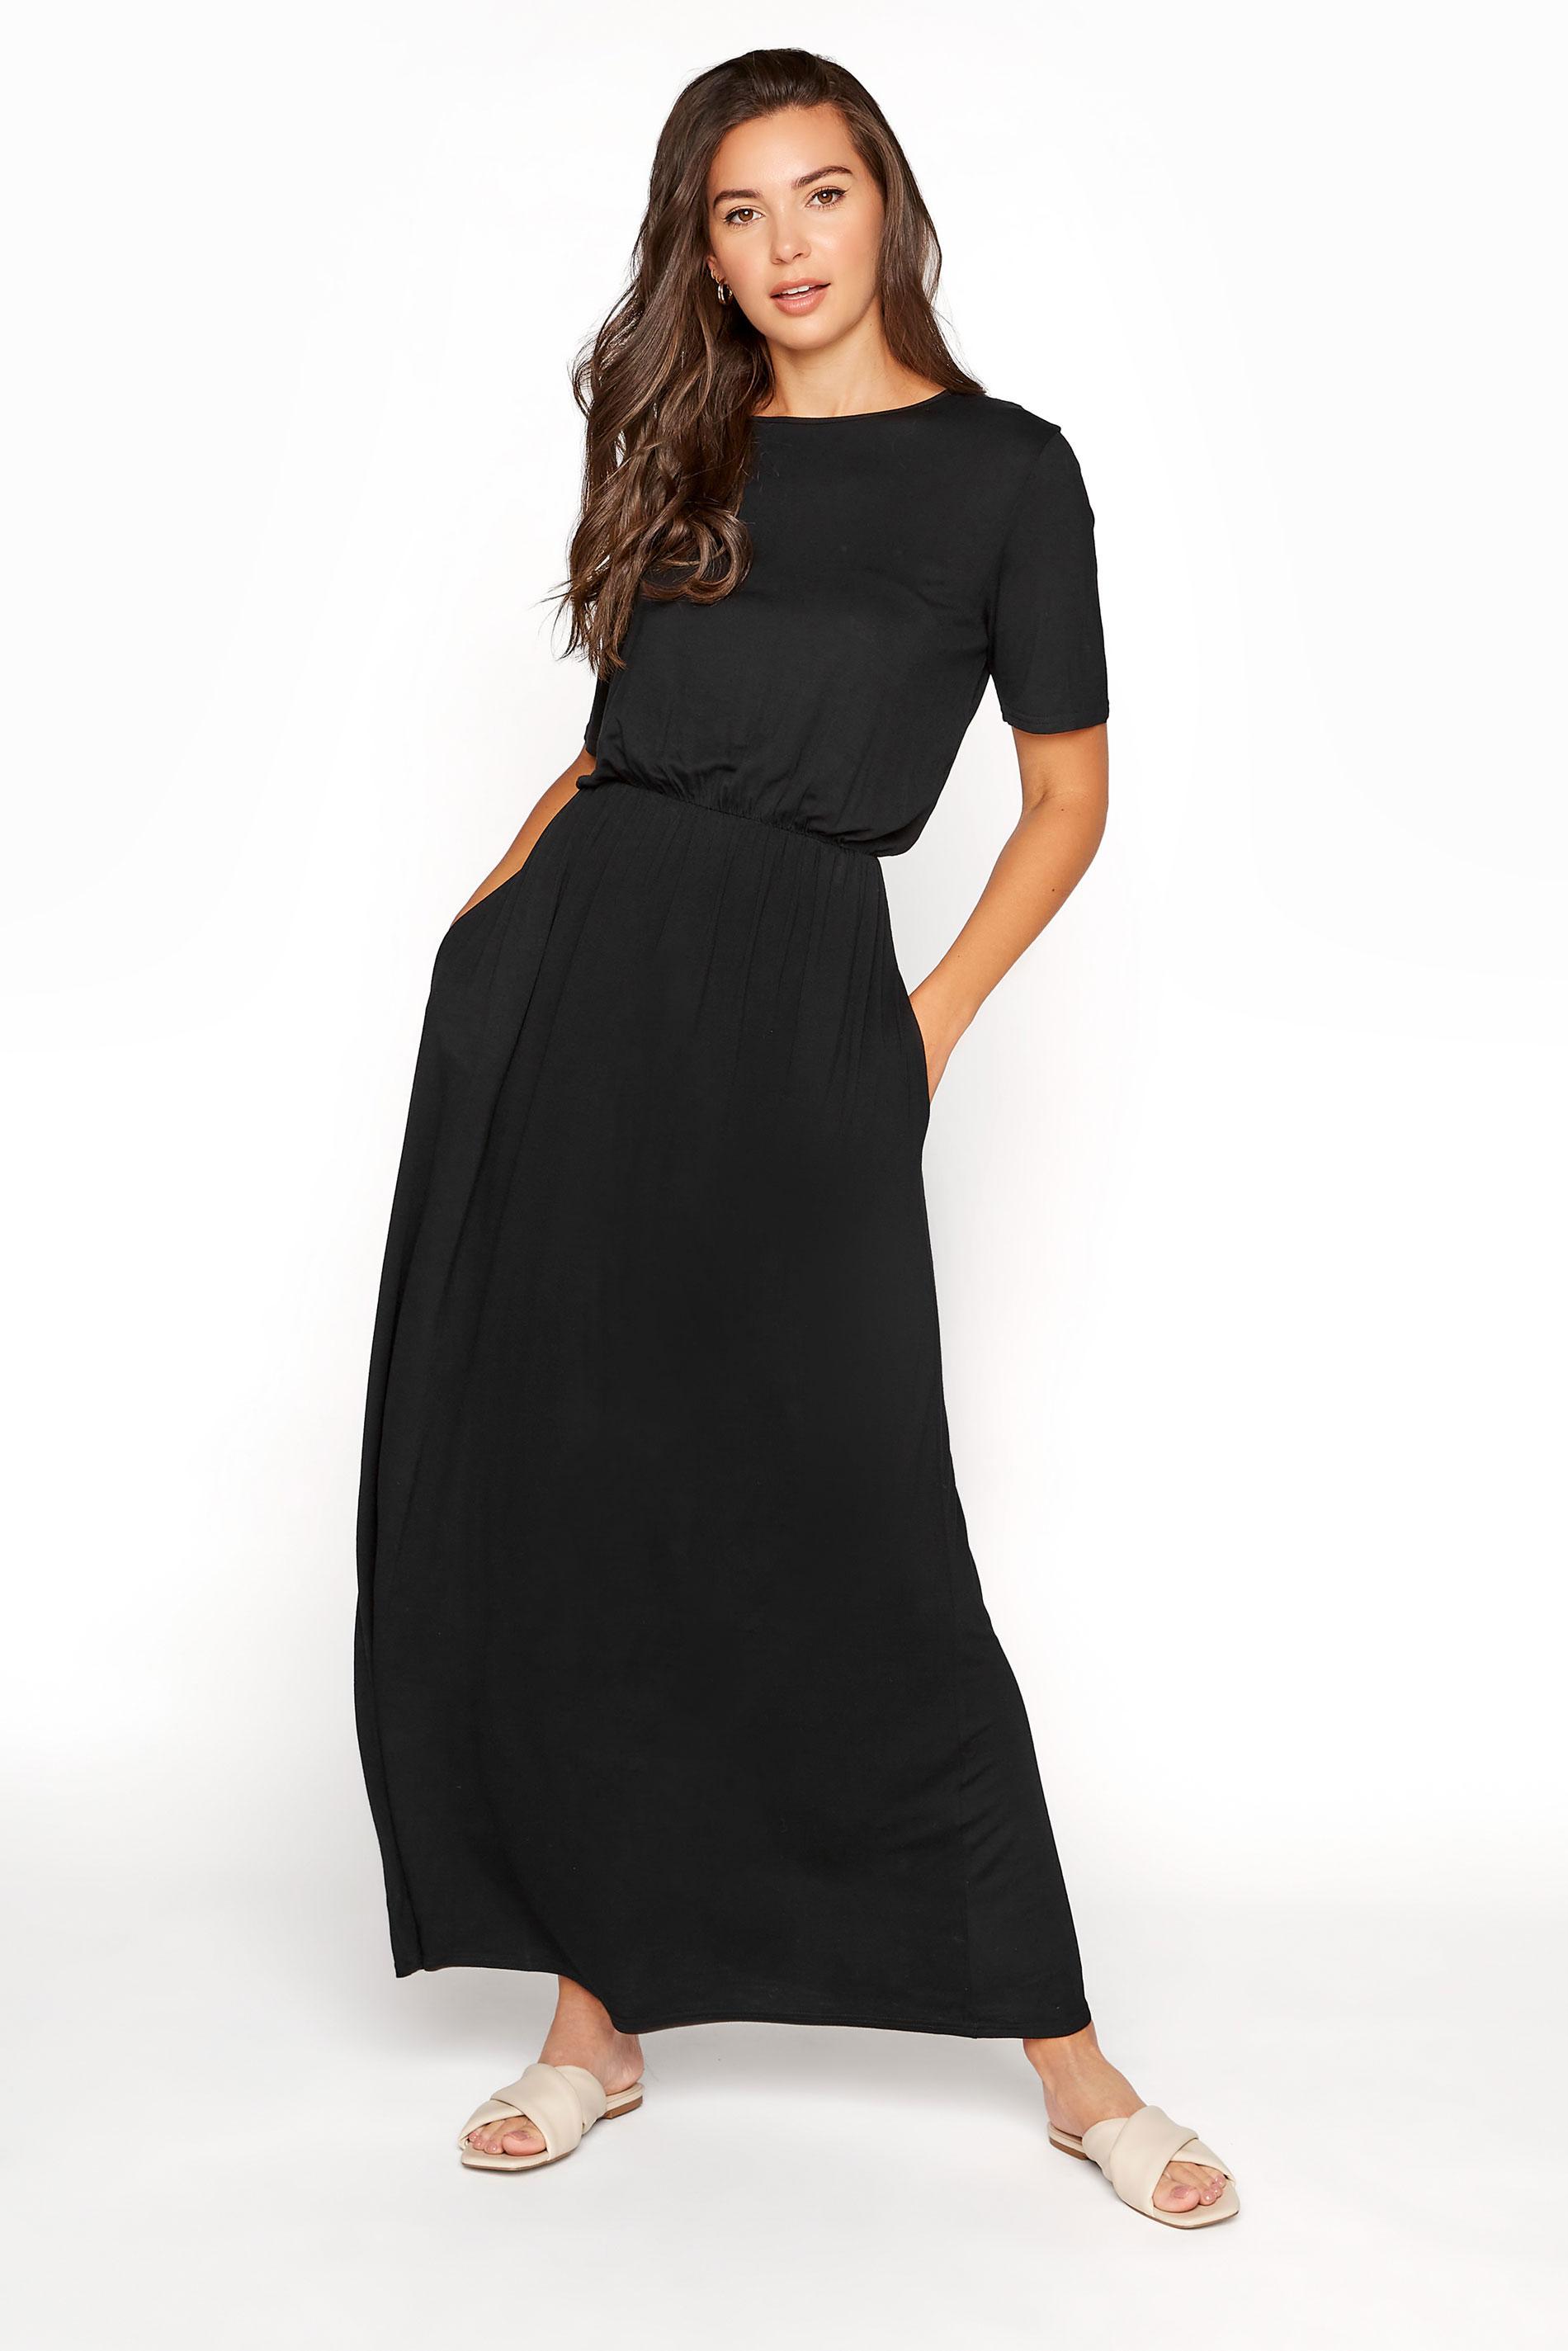 LTS Black Pocket Midaxi Dress_A.jpg